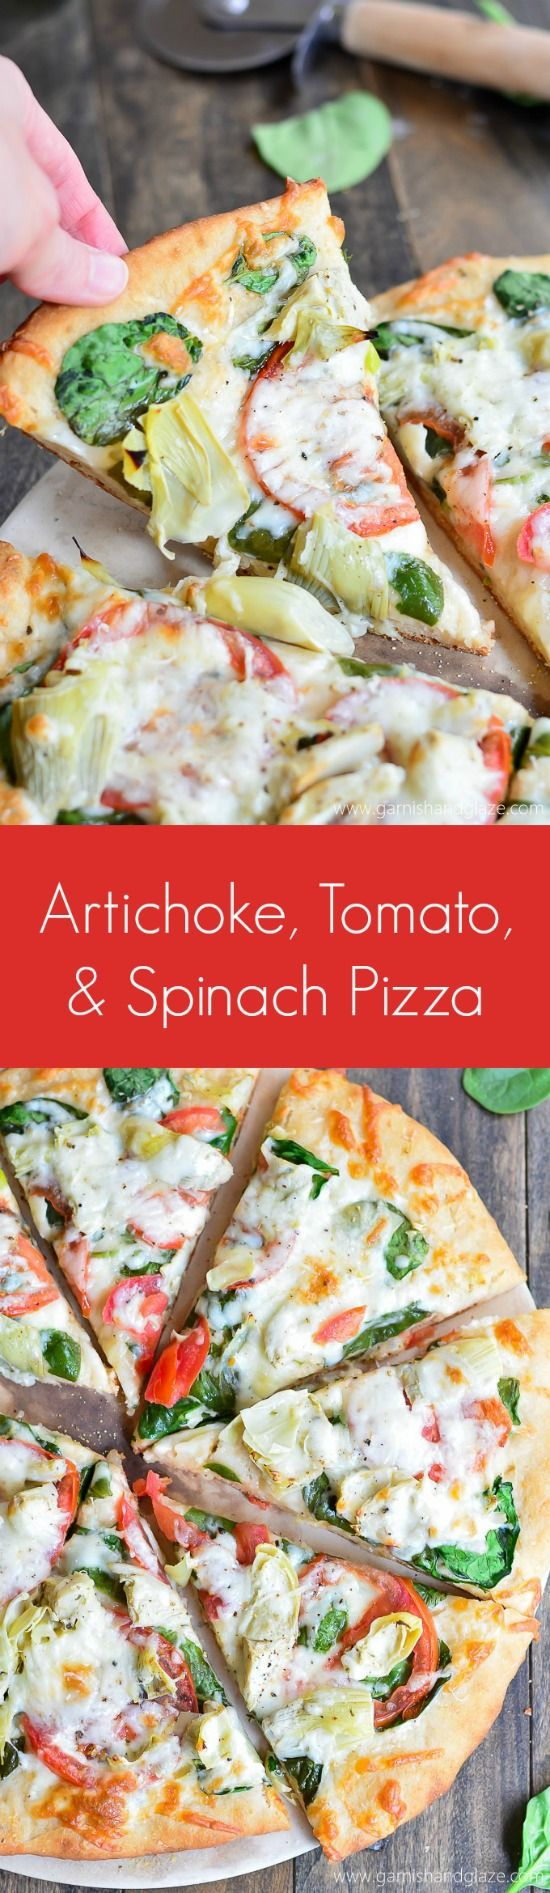 Artichoke, Tomato, and Spinach Pizza Recipe via Garnish & Glaze - Go meatless with this veggie topped Artichoke, Tomato, and Spinach Pizza made on a No Knead, No Rise Pizza Dough crust.